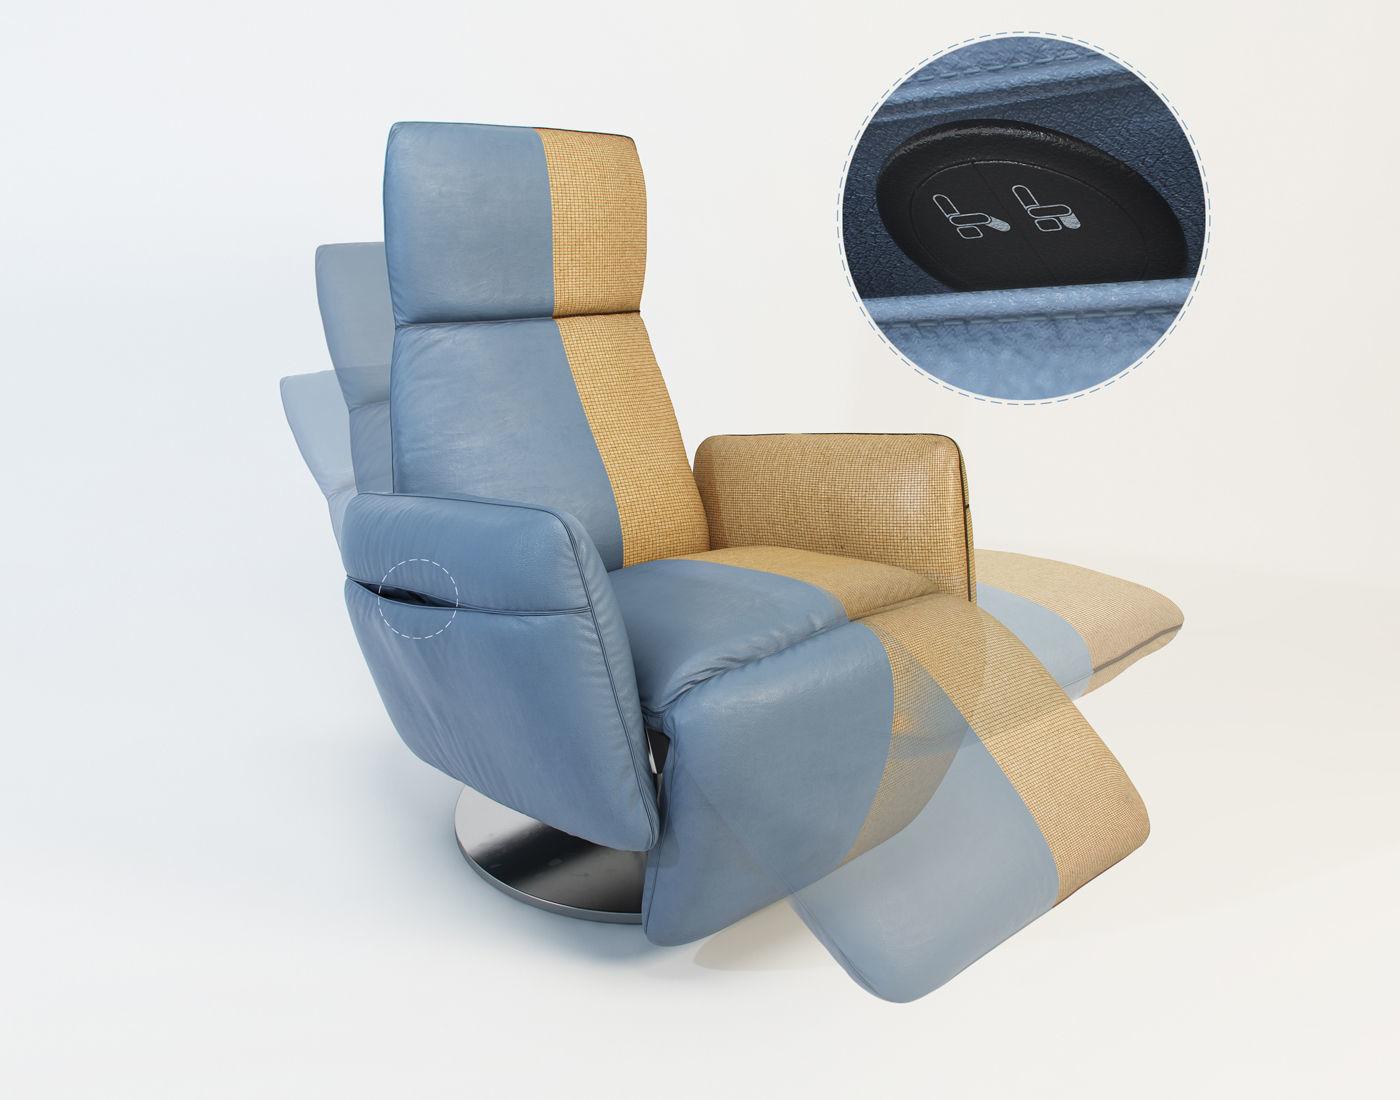 Poltrona Frau Pillow.Poltrona Frau Pillow Armchair 3 Different Positions 3d Model